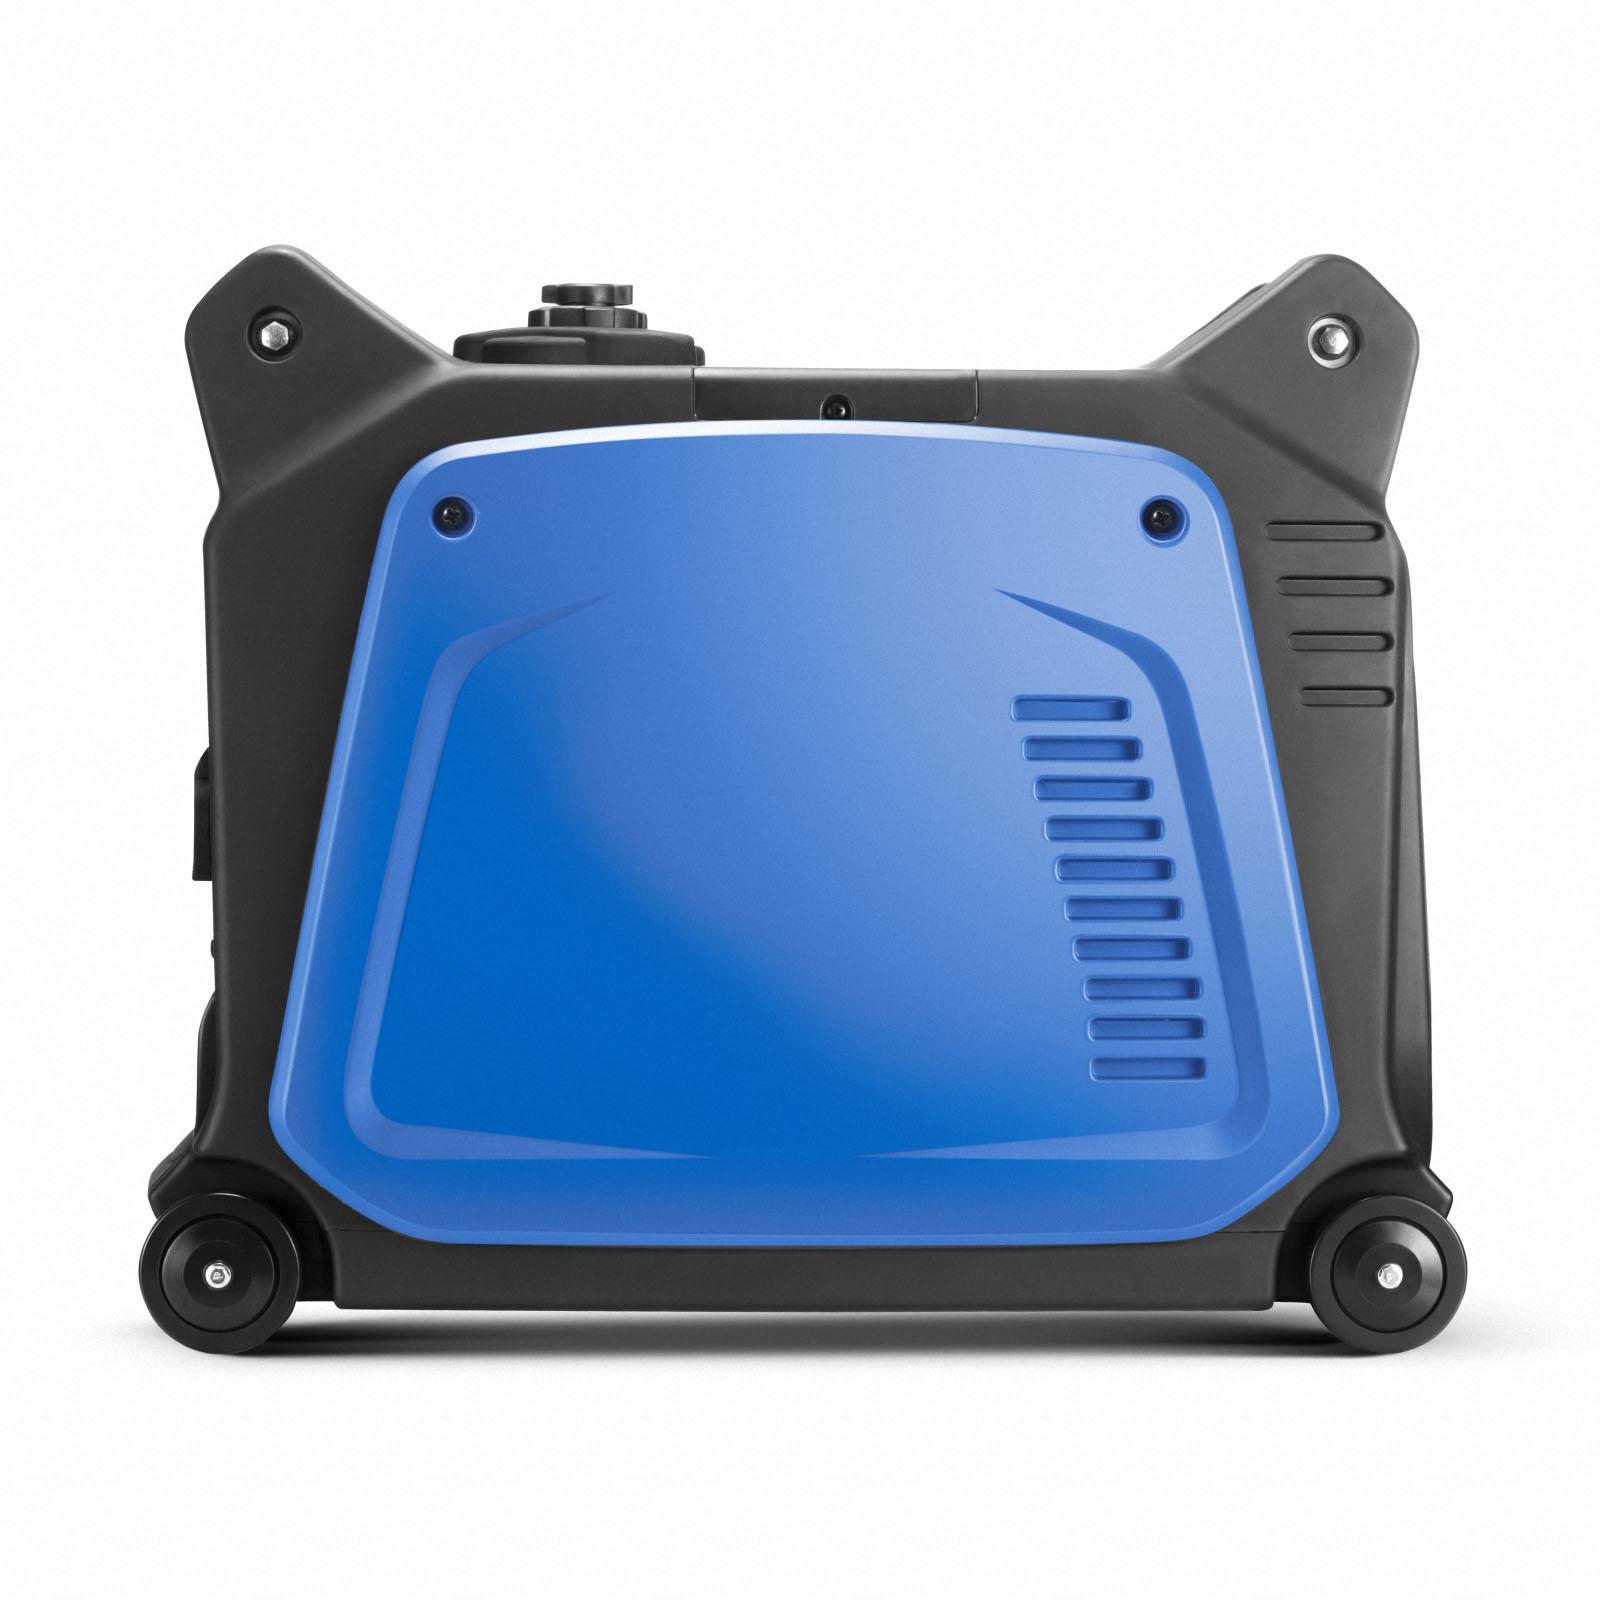 GenTrax Inverter Generator 3.5KW Max 12v Remote Start Portable Petrol Camping 4